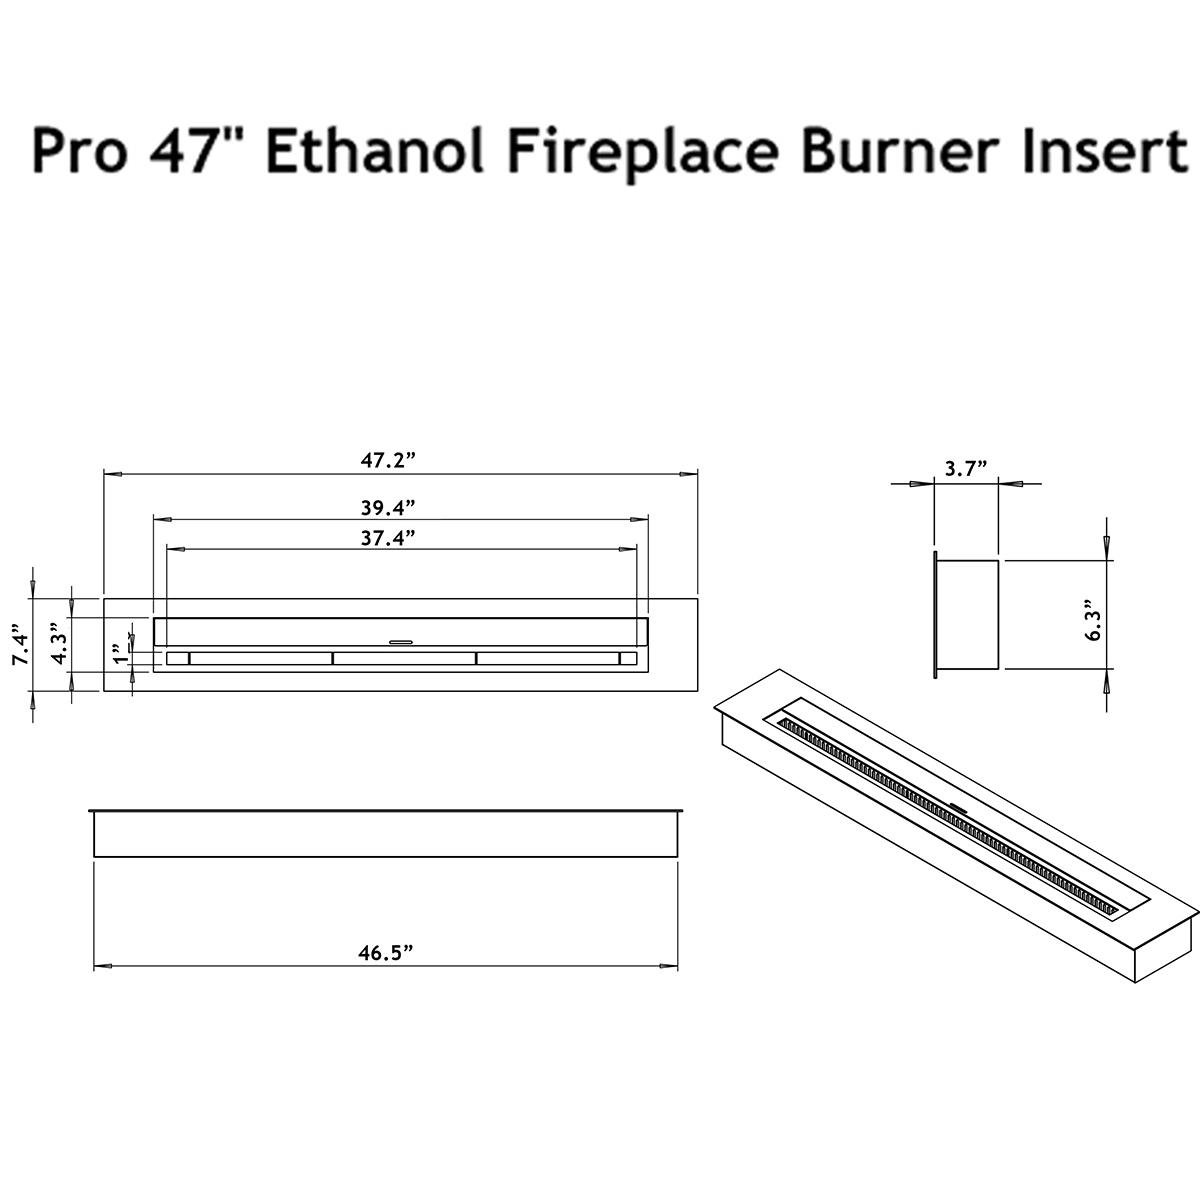 moda flame pro 47 ethanol fireplace burner insert